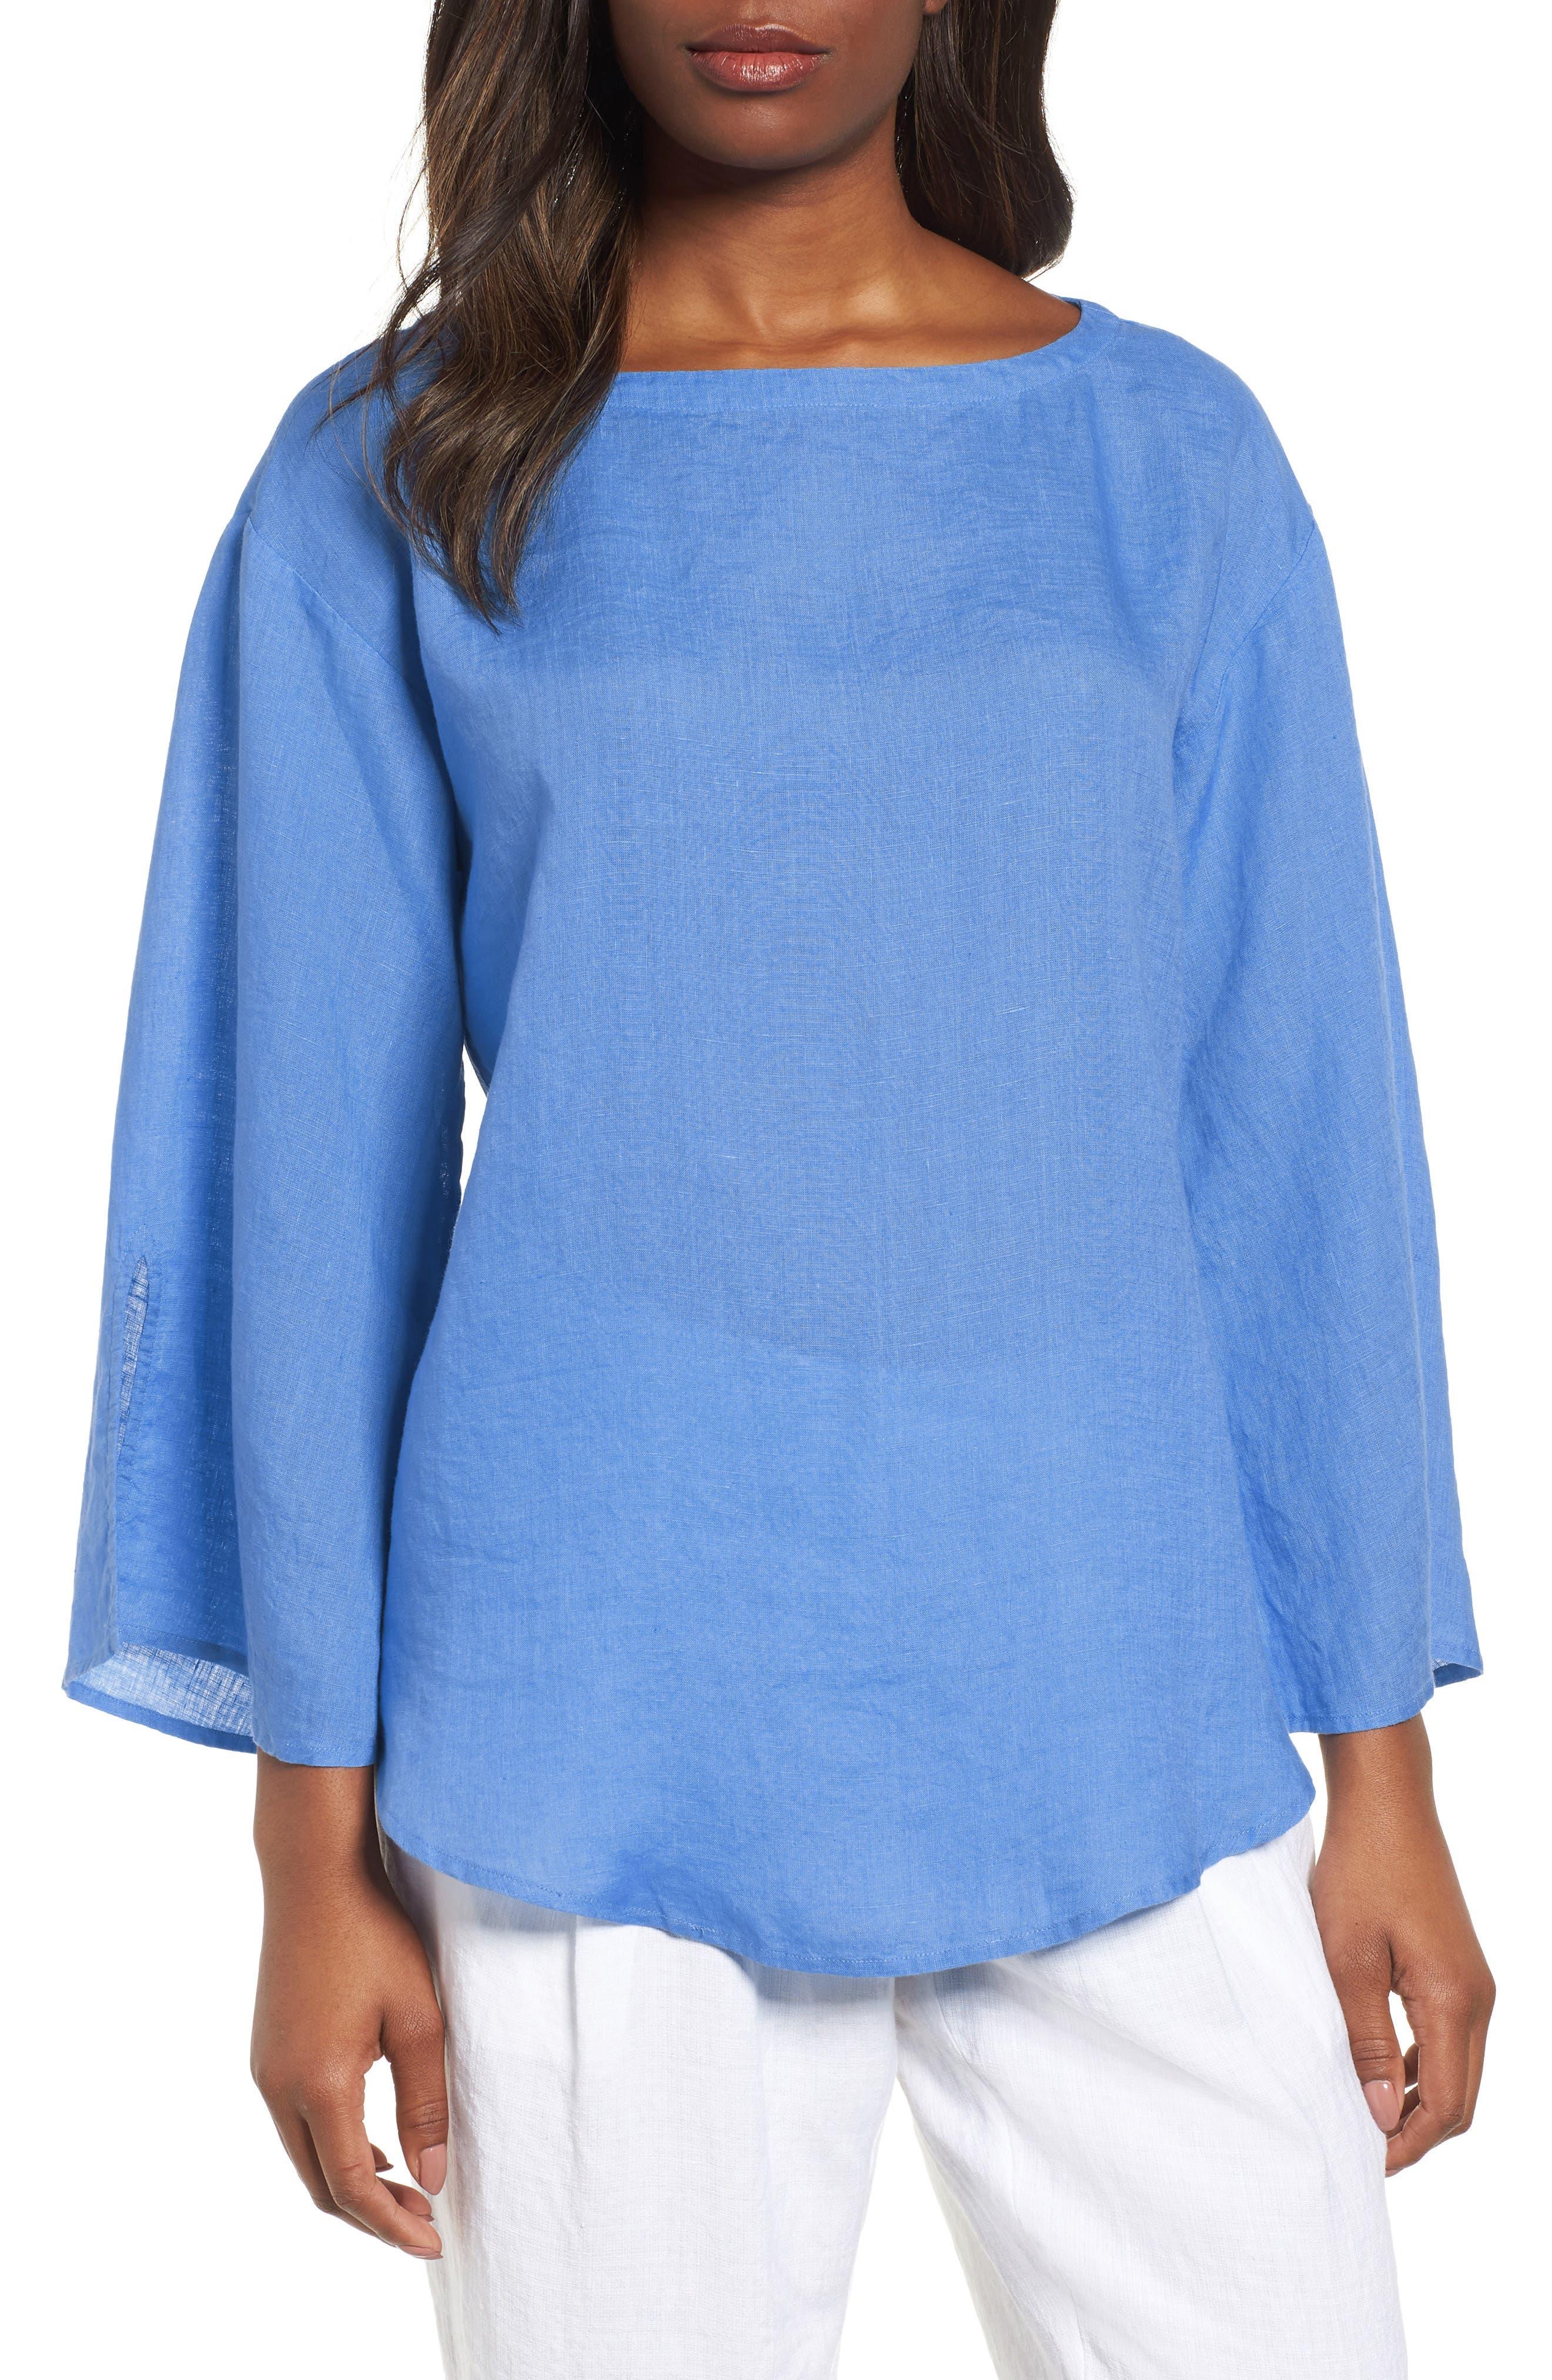 Woven Organic Linen Top,                         Main,                         color, Bluebell